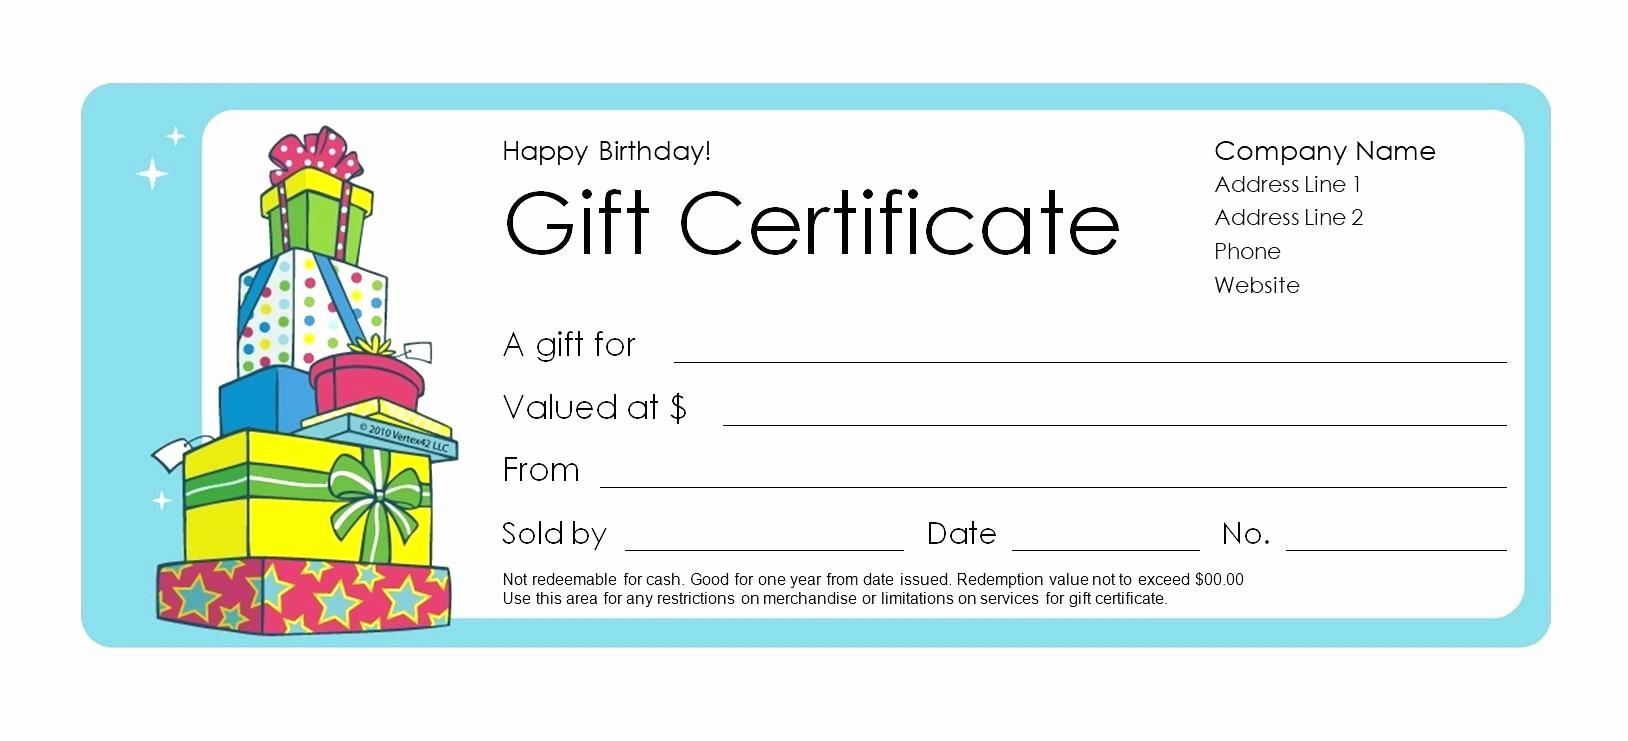 Microsoft Word Certificate Template Free Inspirational Template Microsoft Word Gift Certificate Template